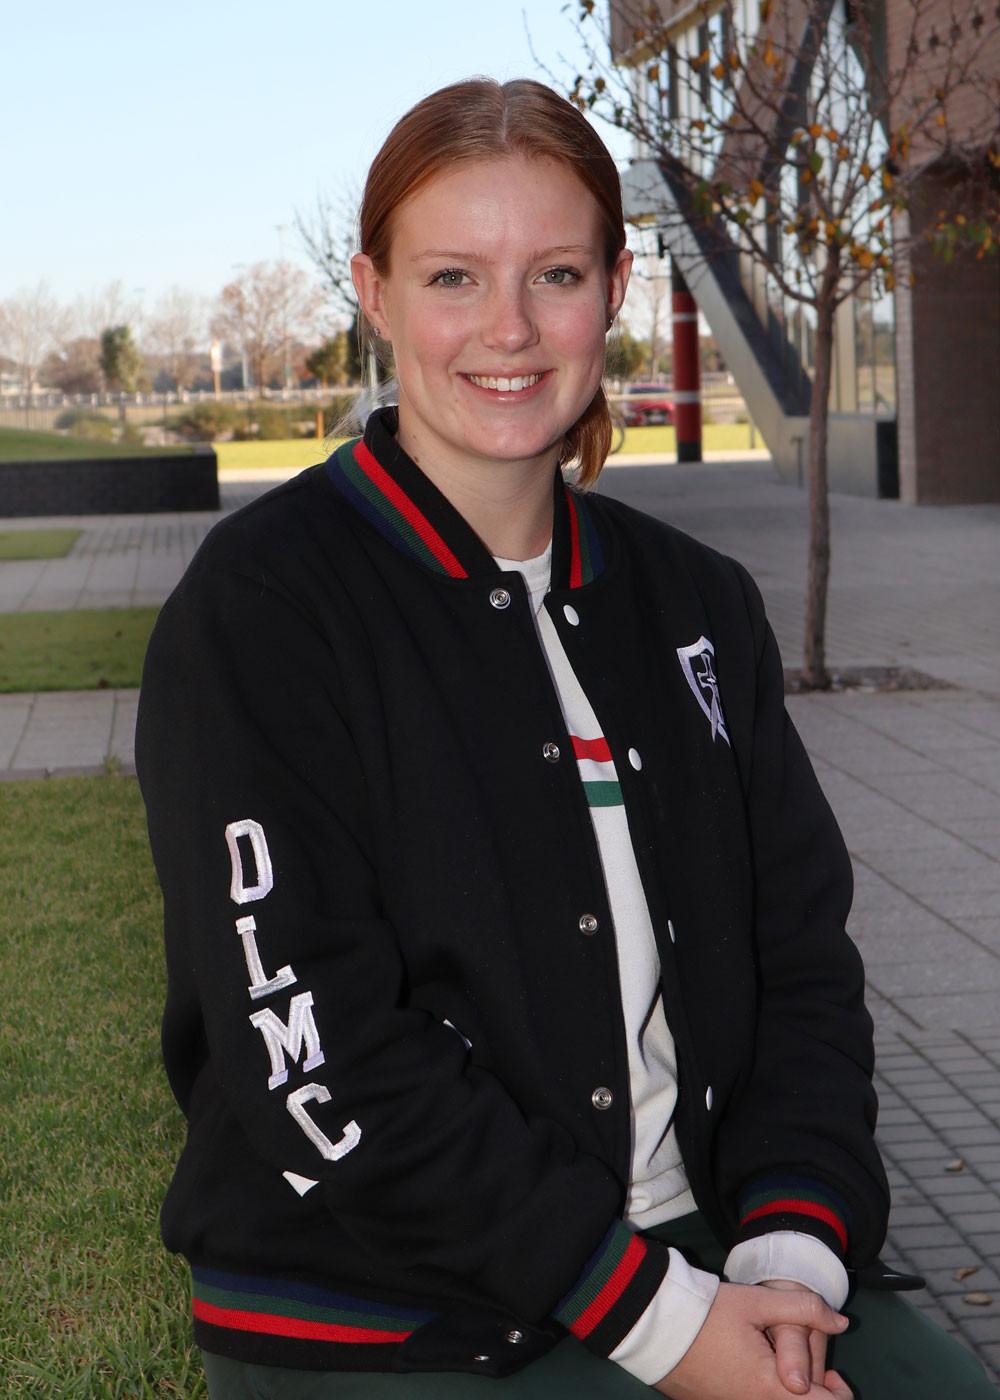 Elysia Shields enjoys volunteering for Meals on Wheels